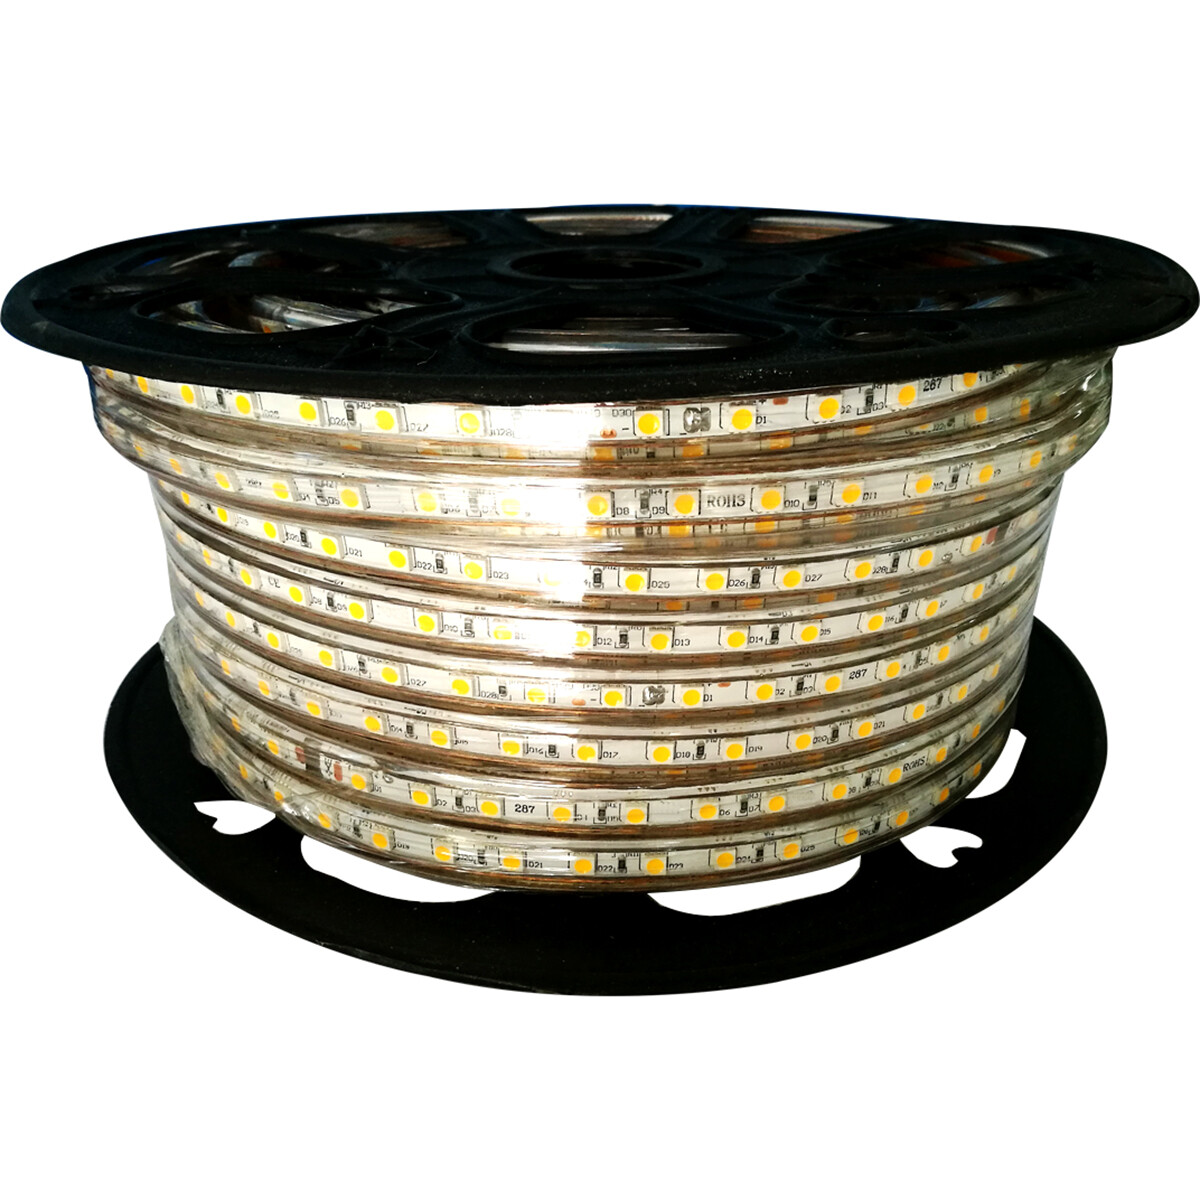 LED Strip - Aigi Strabo - 50 Meter - Dimbaar - IP65 Waterdicht - Warm Wit 3000K - 5050 SMD 230V